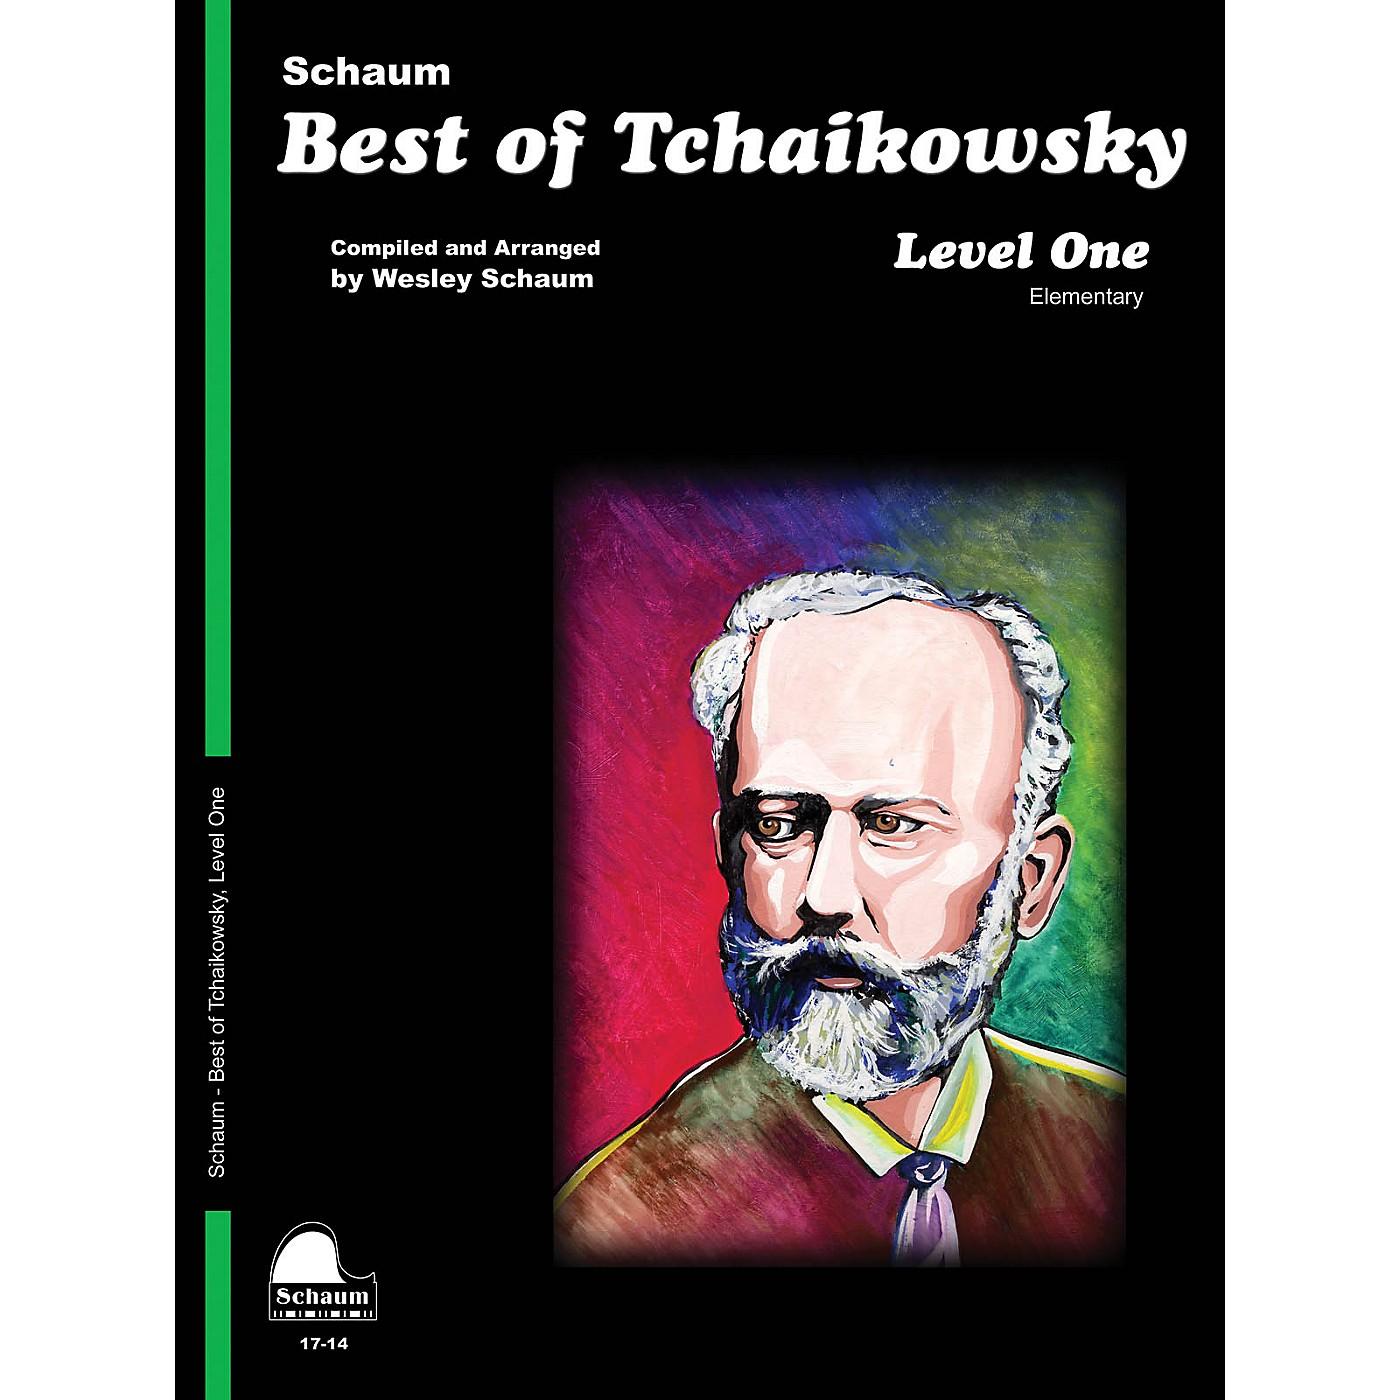 SCHAUM Best of Tchaikowsky (Level 1 Elem Level) Educational Piano Book thumbnail